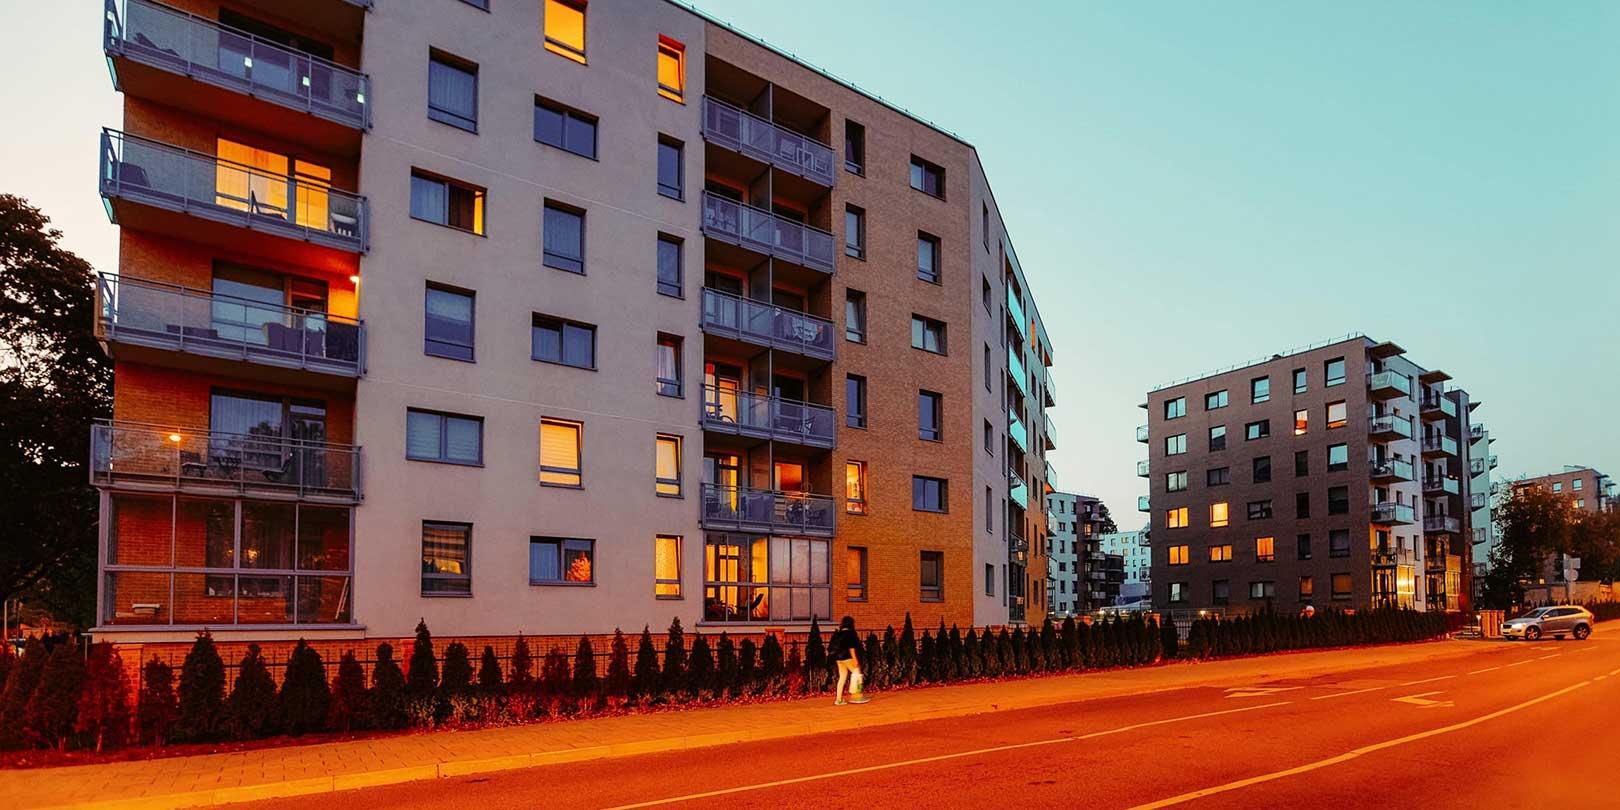 Modern residential apartment buildings